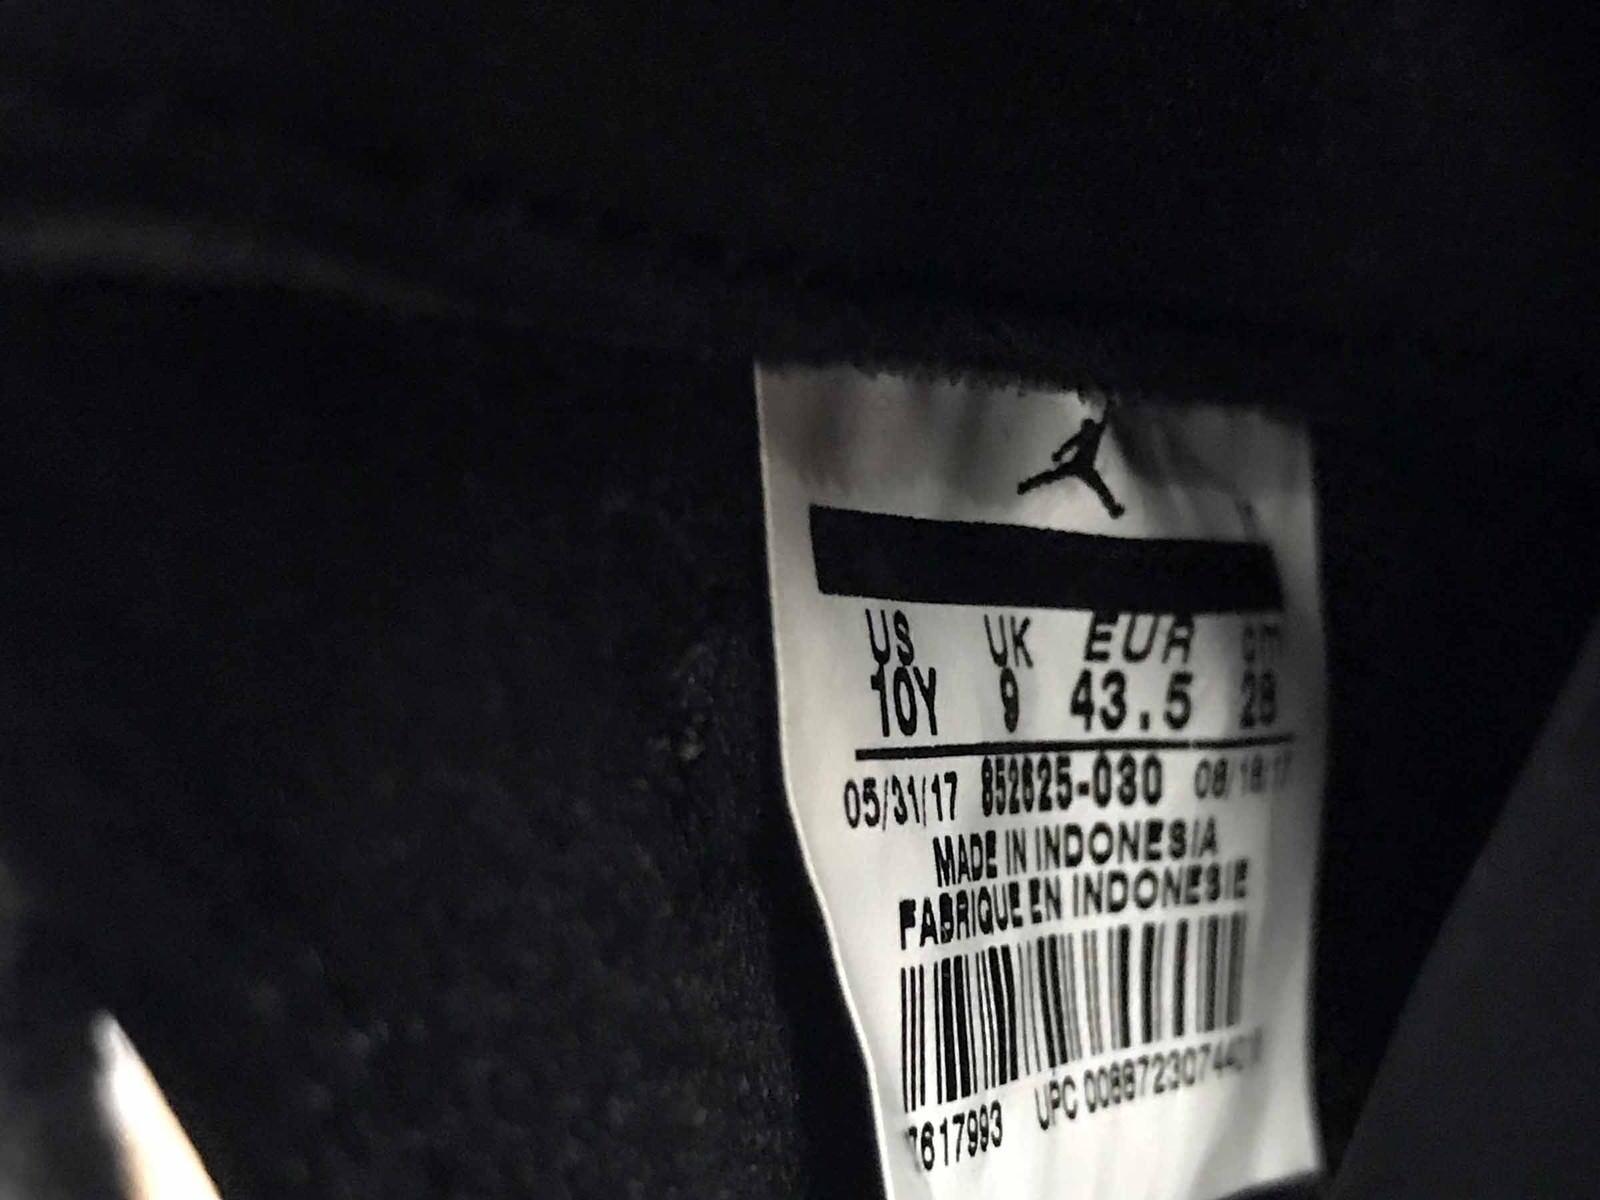 Air Jordan 11 11 11 Retro Premium Heiress nero Metallic oro 852625 030 New in Box 1a7f5d